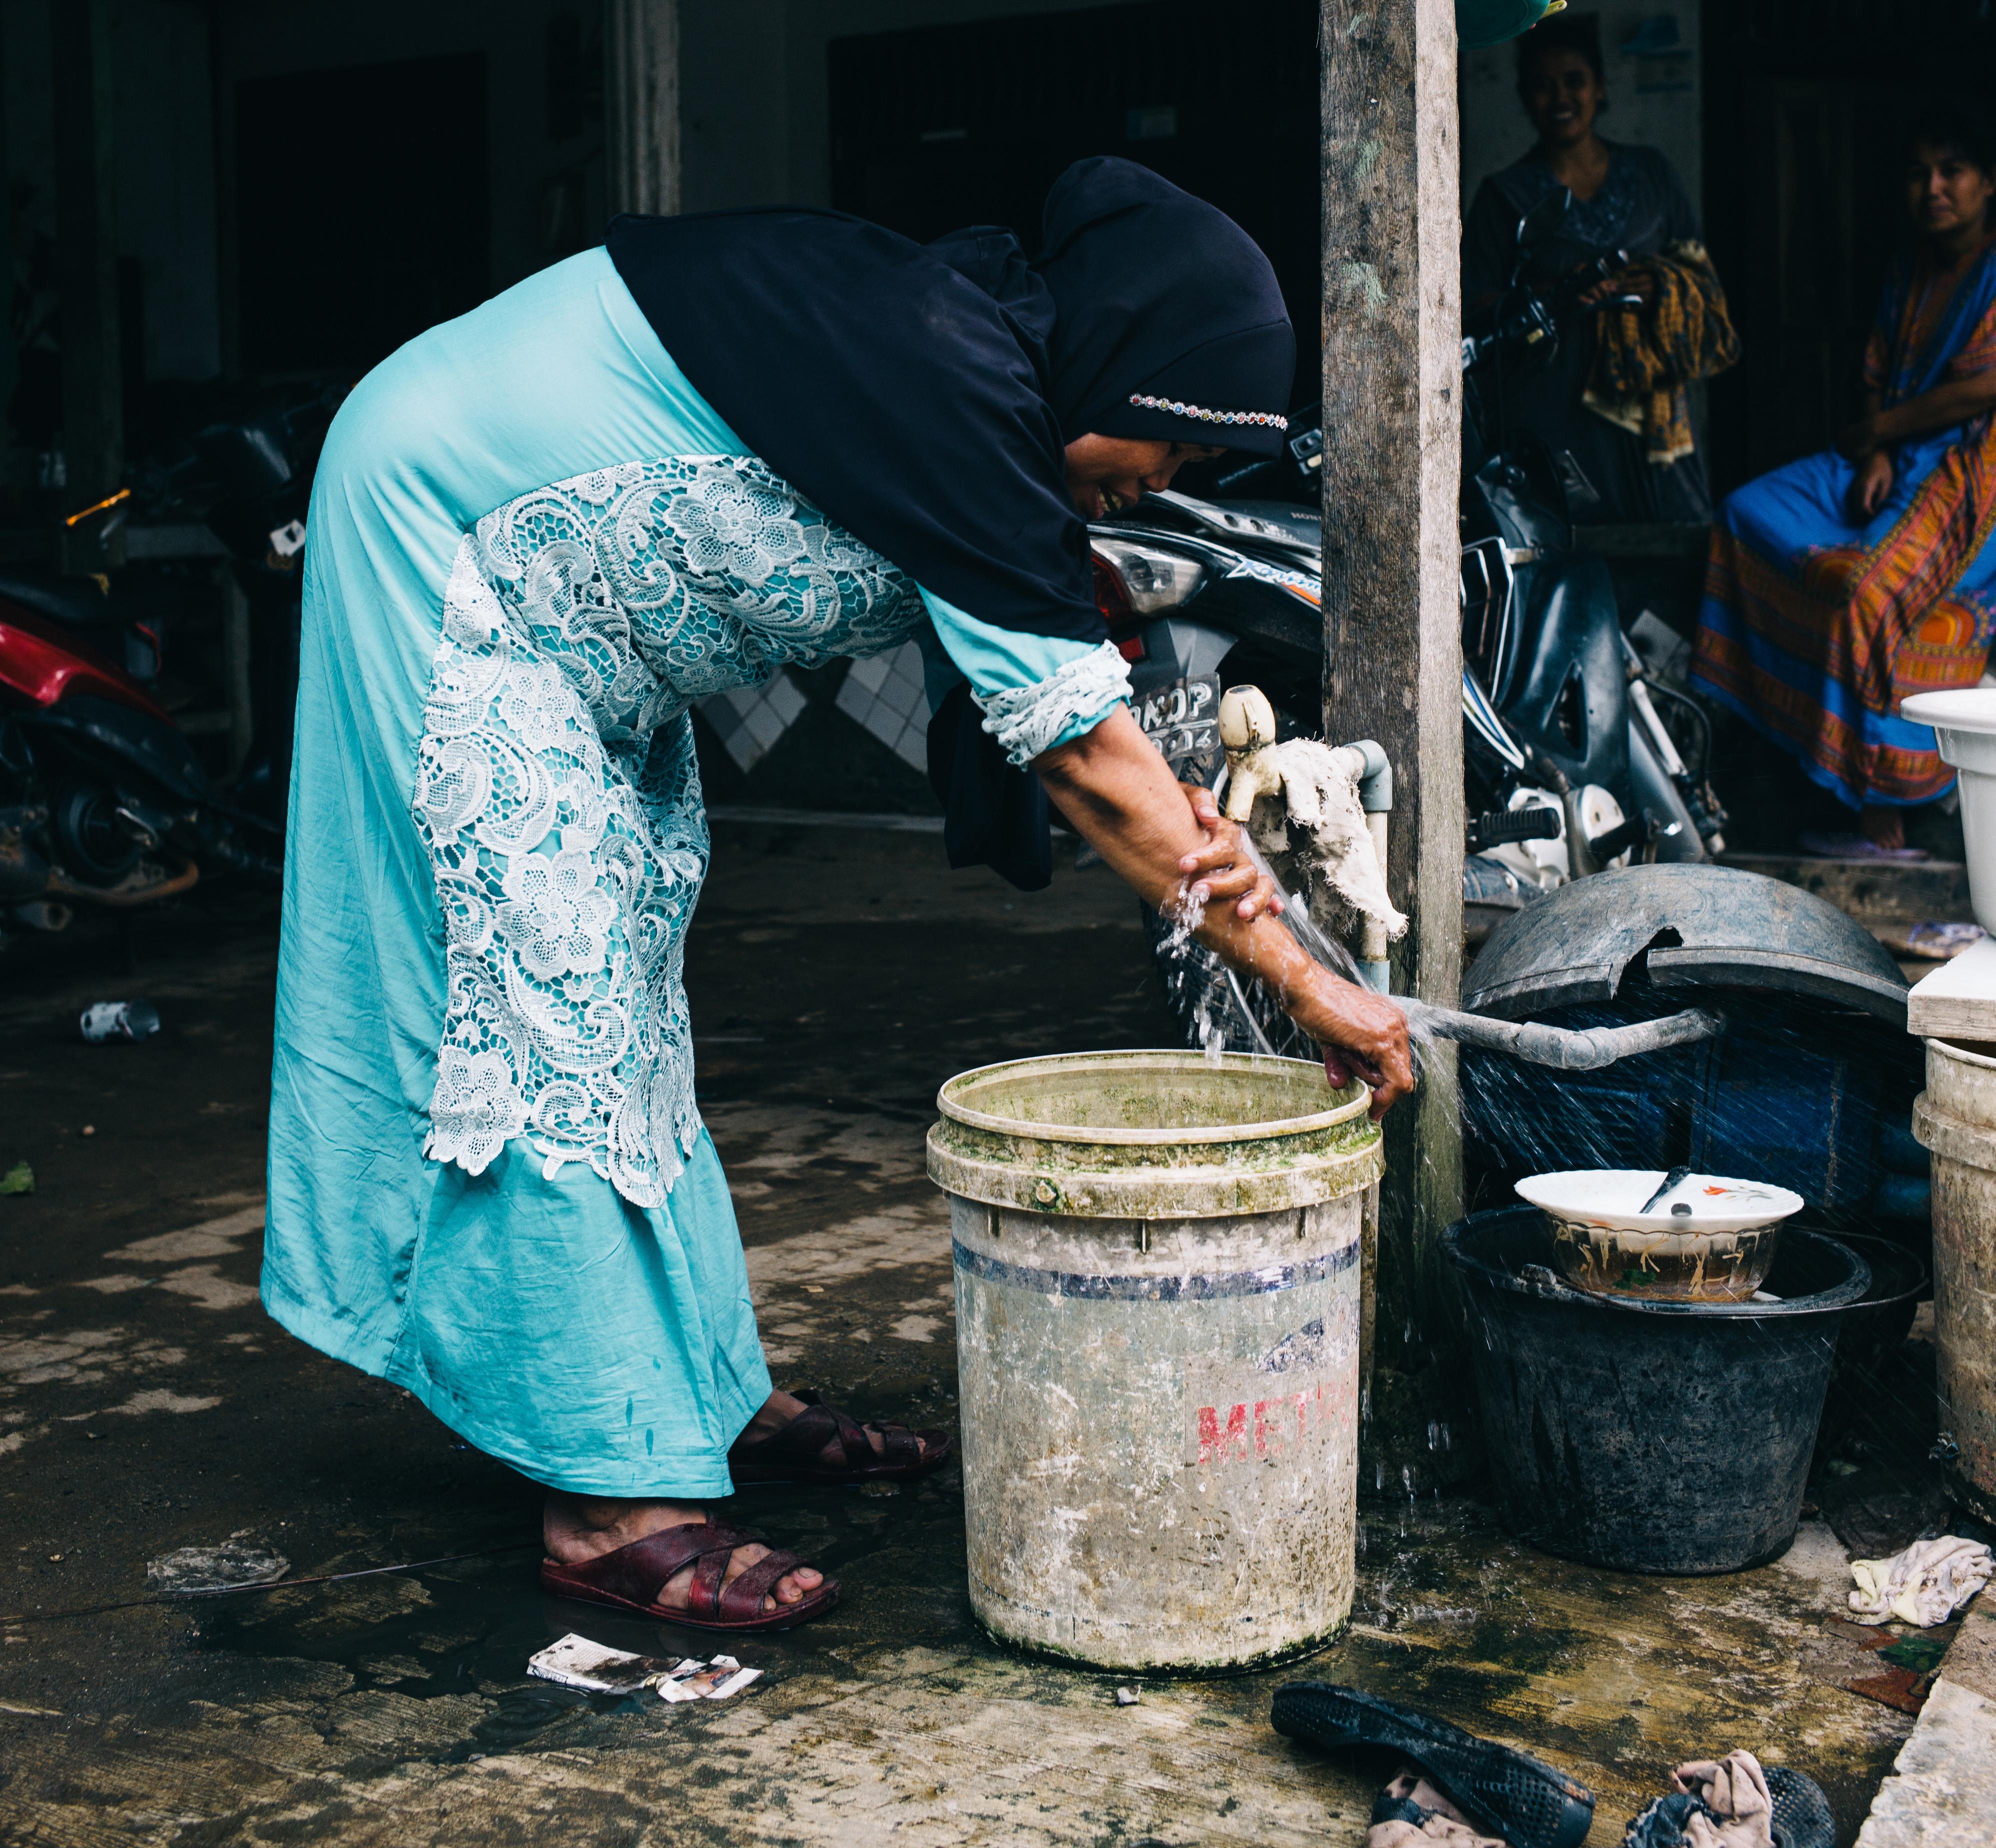 Sarmanah using her safe water tap